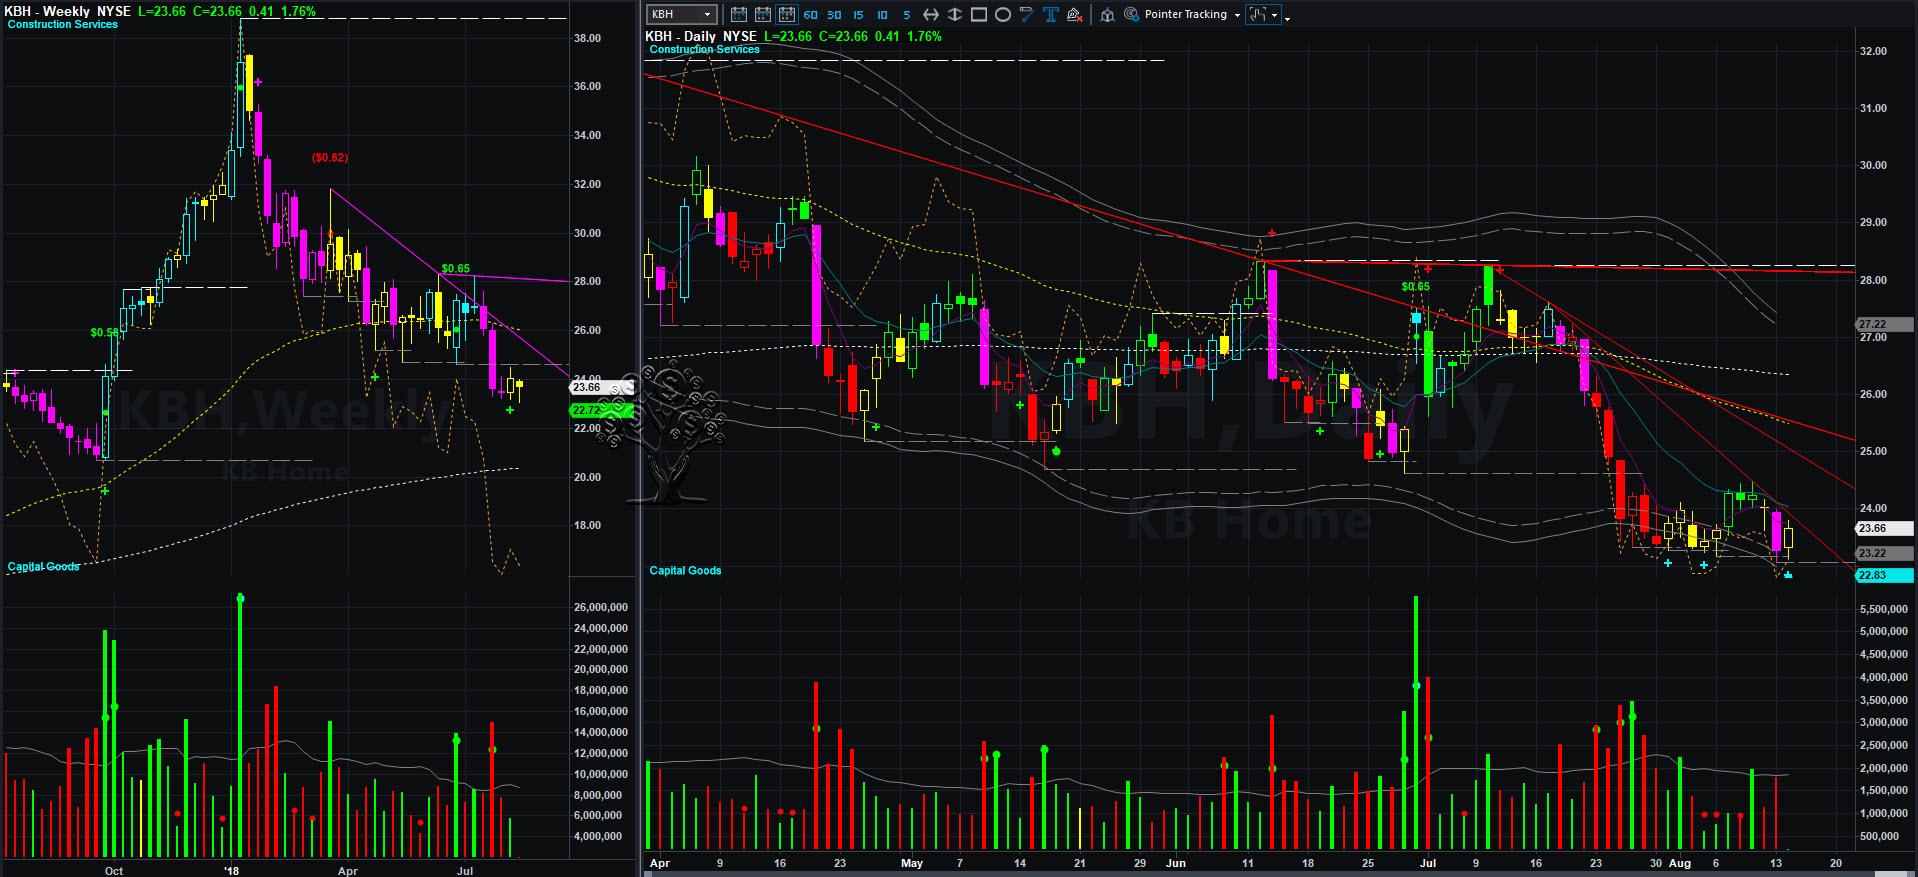 kbh charts 2018-08-14_11-20-28.jpg